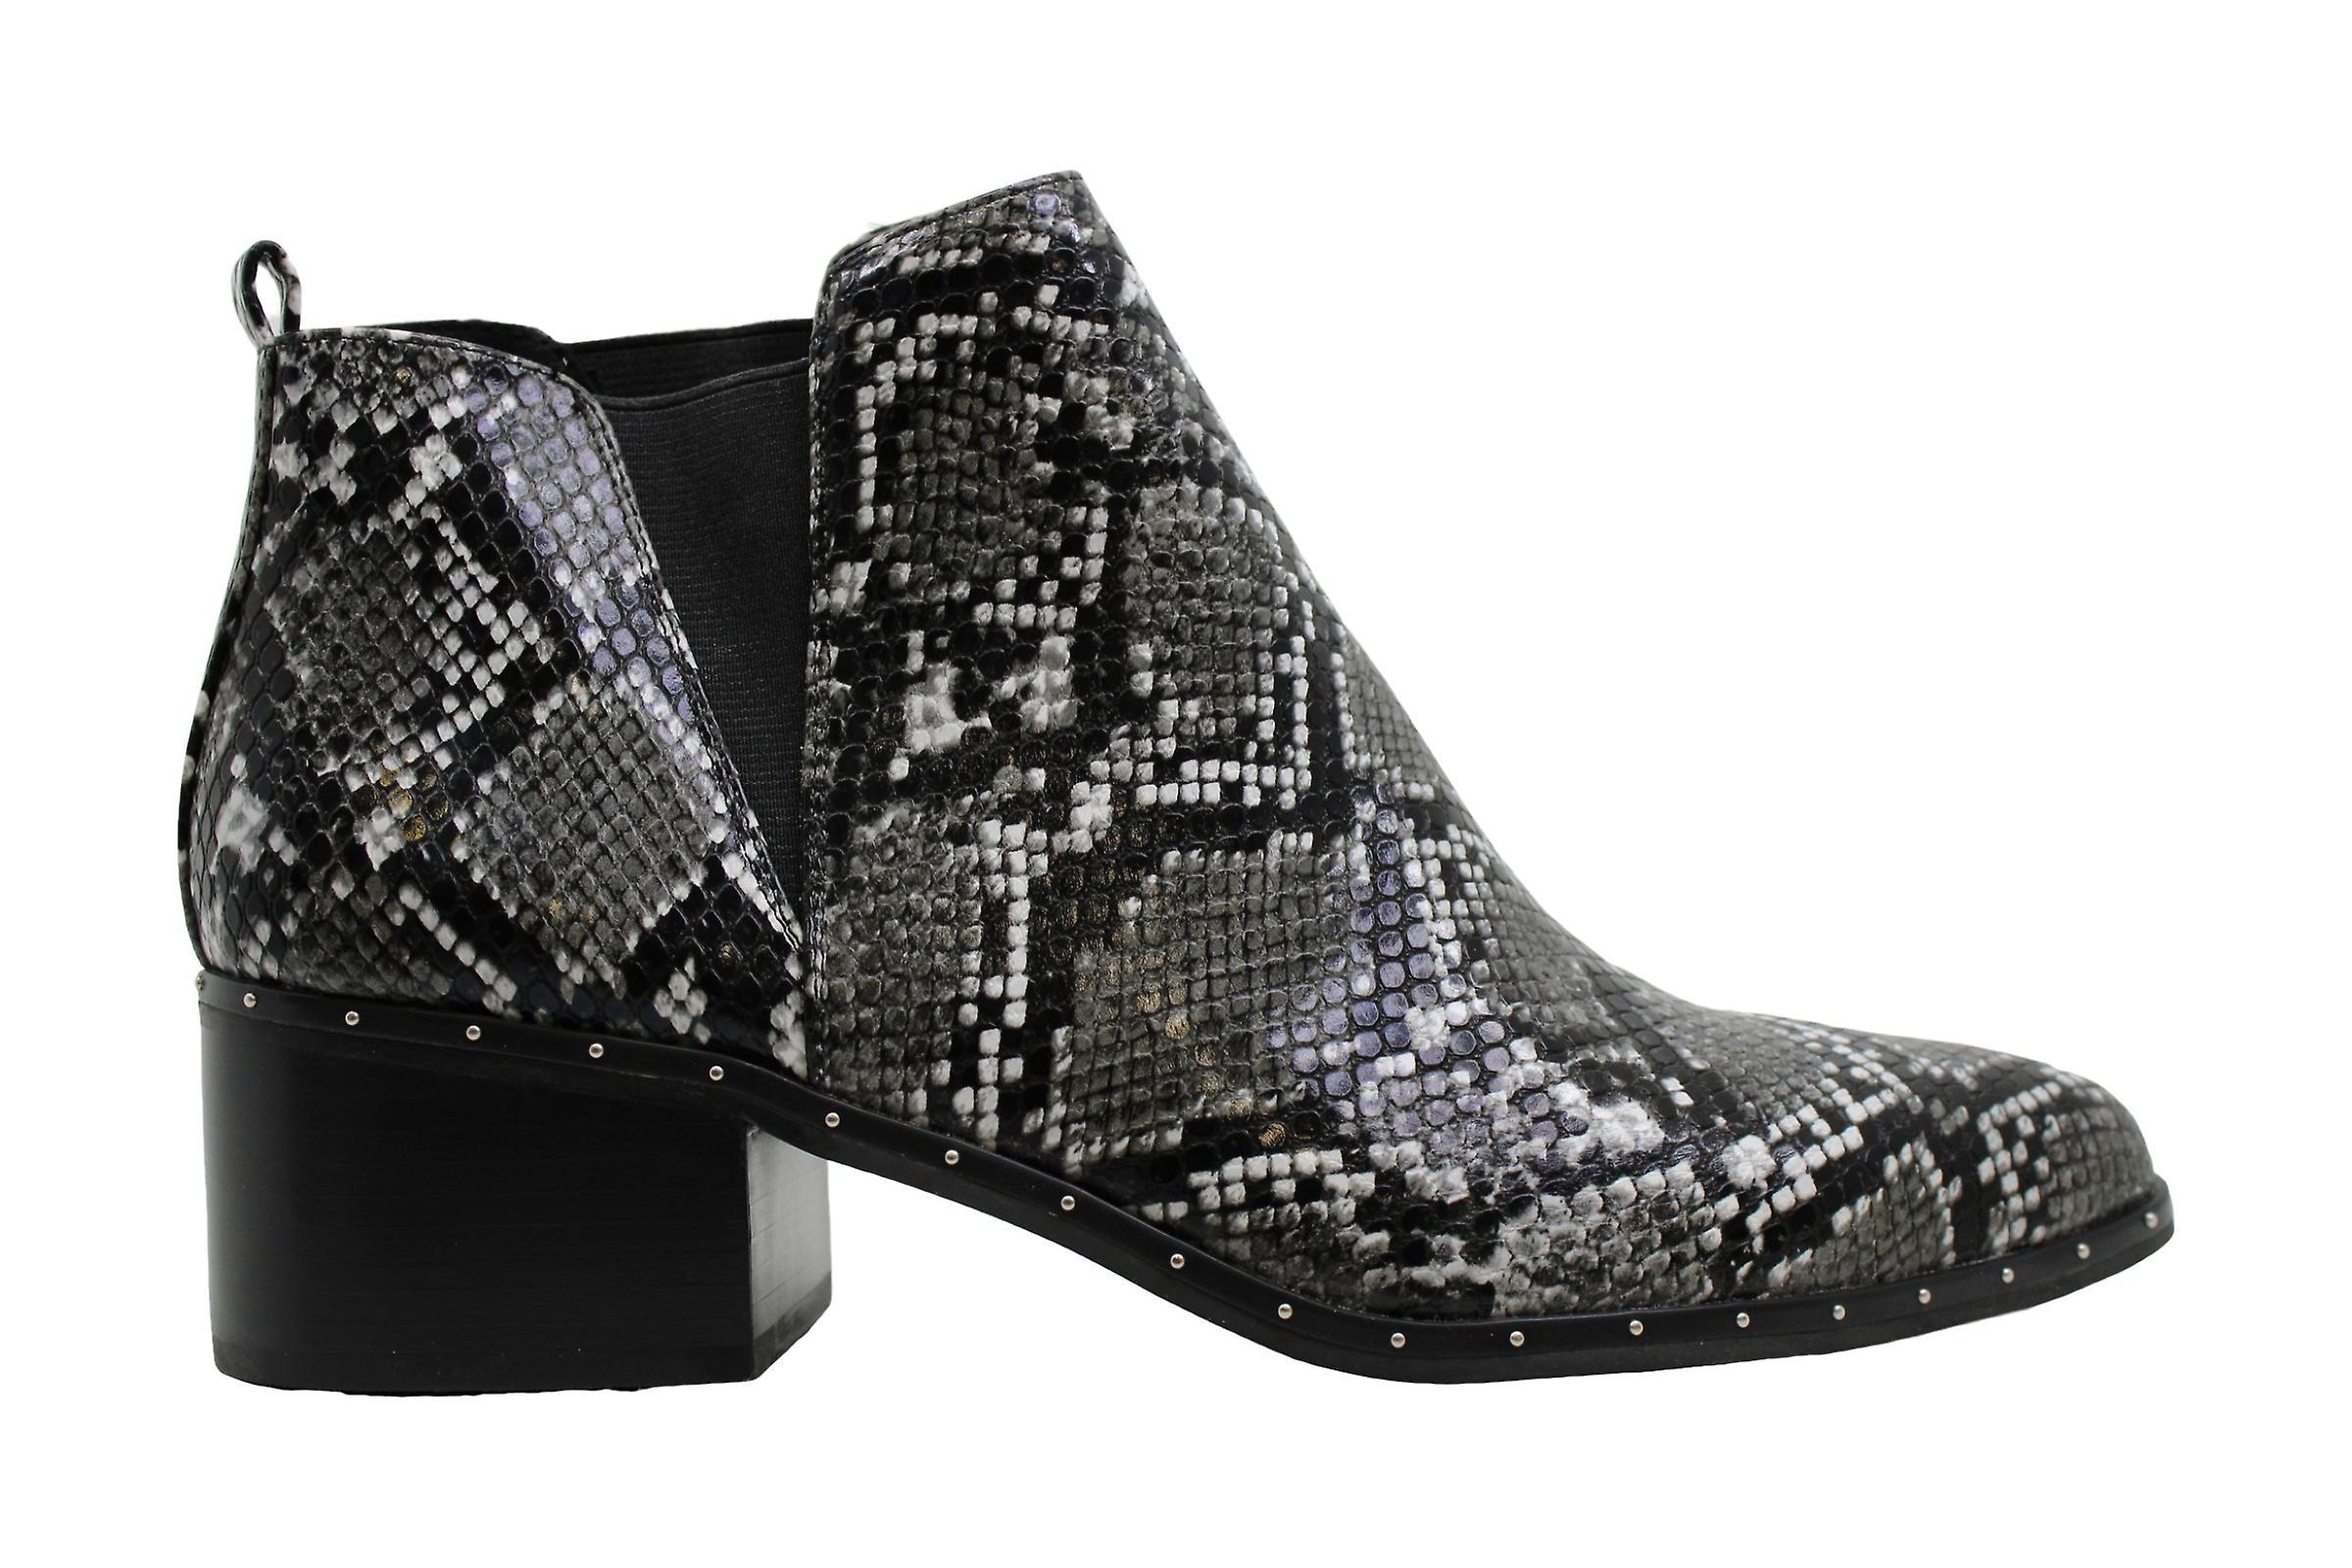 Bar III Femmes Gabby Cuir Fermé Toe Ankle Fashion Boots